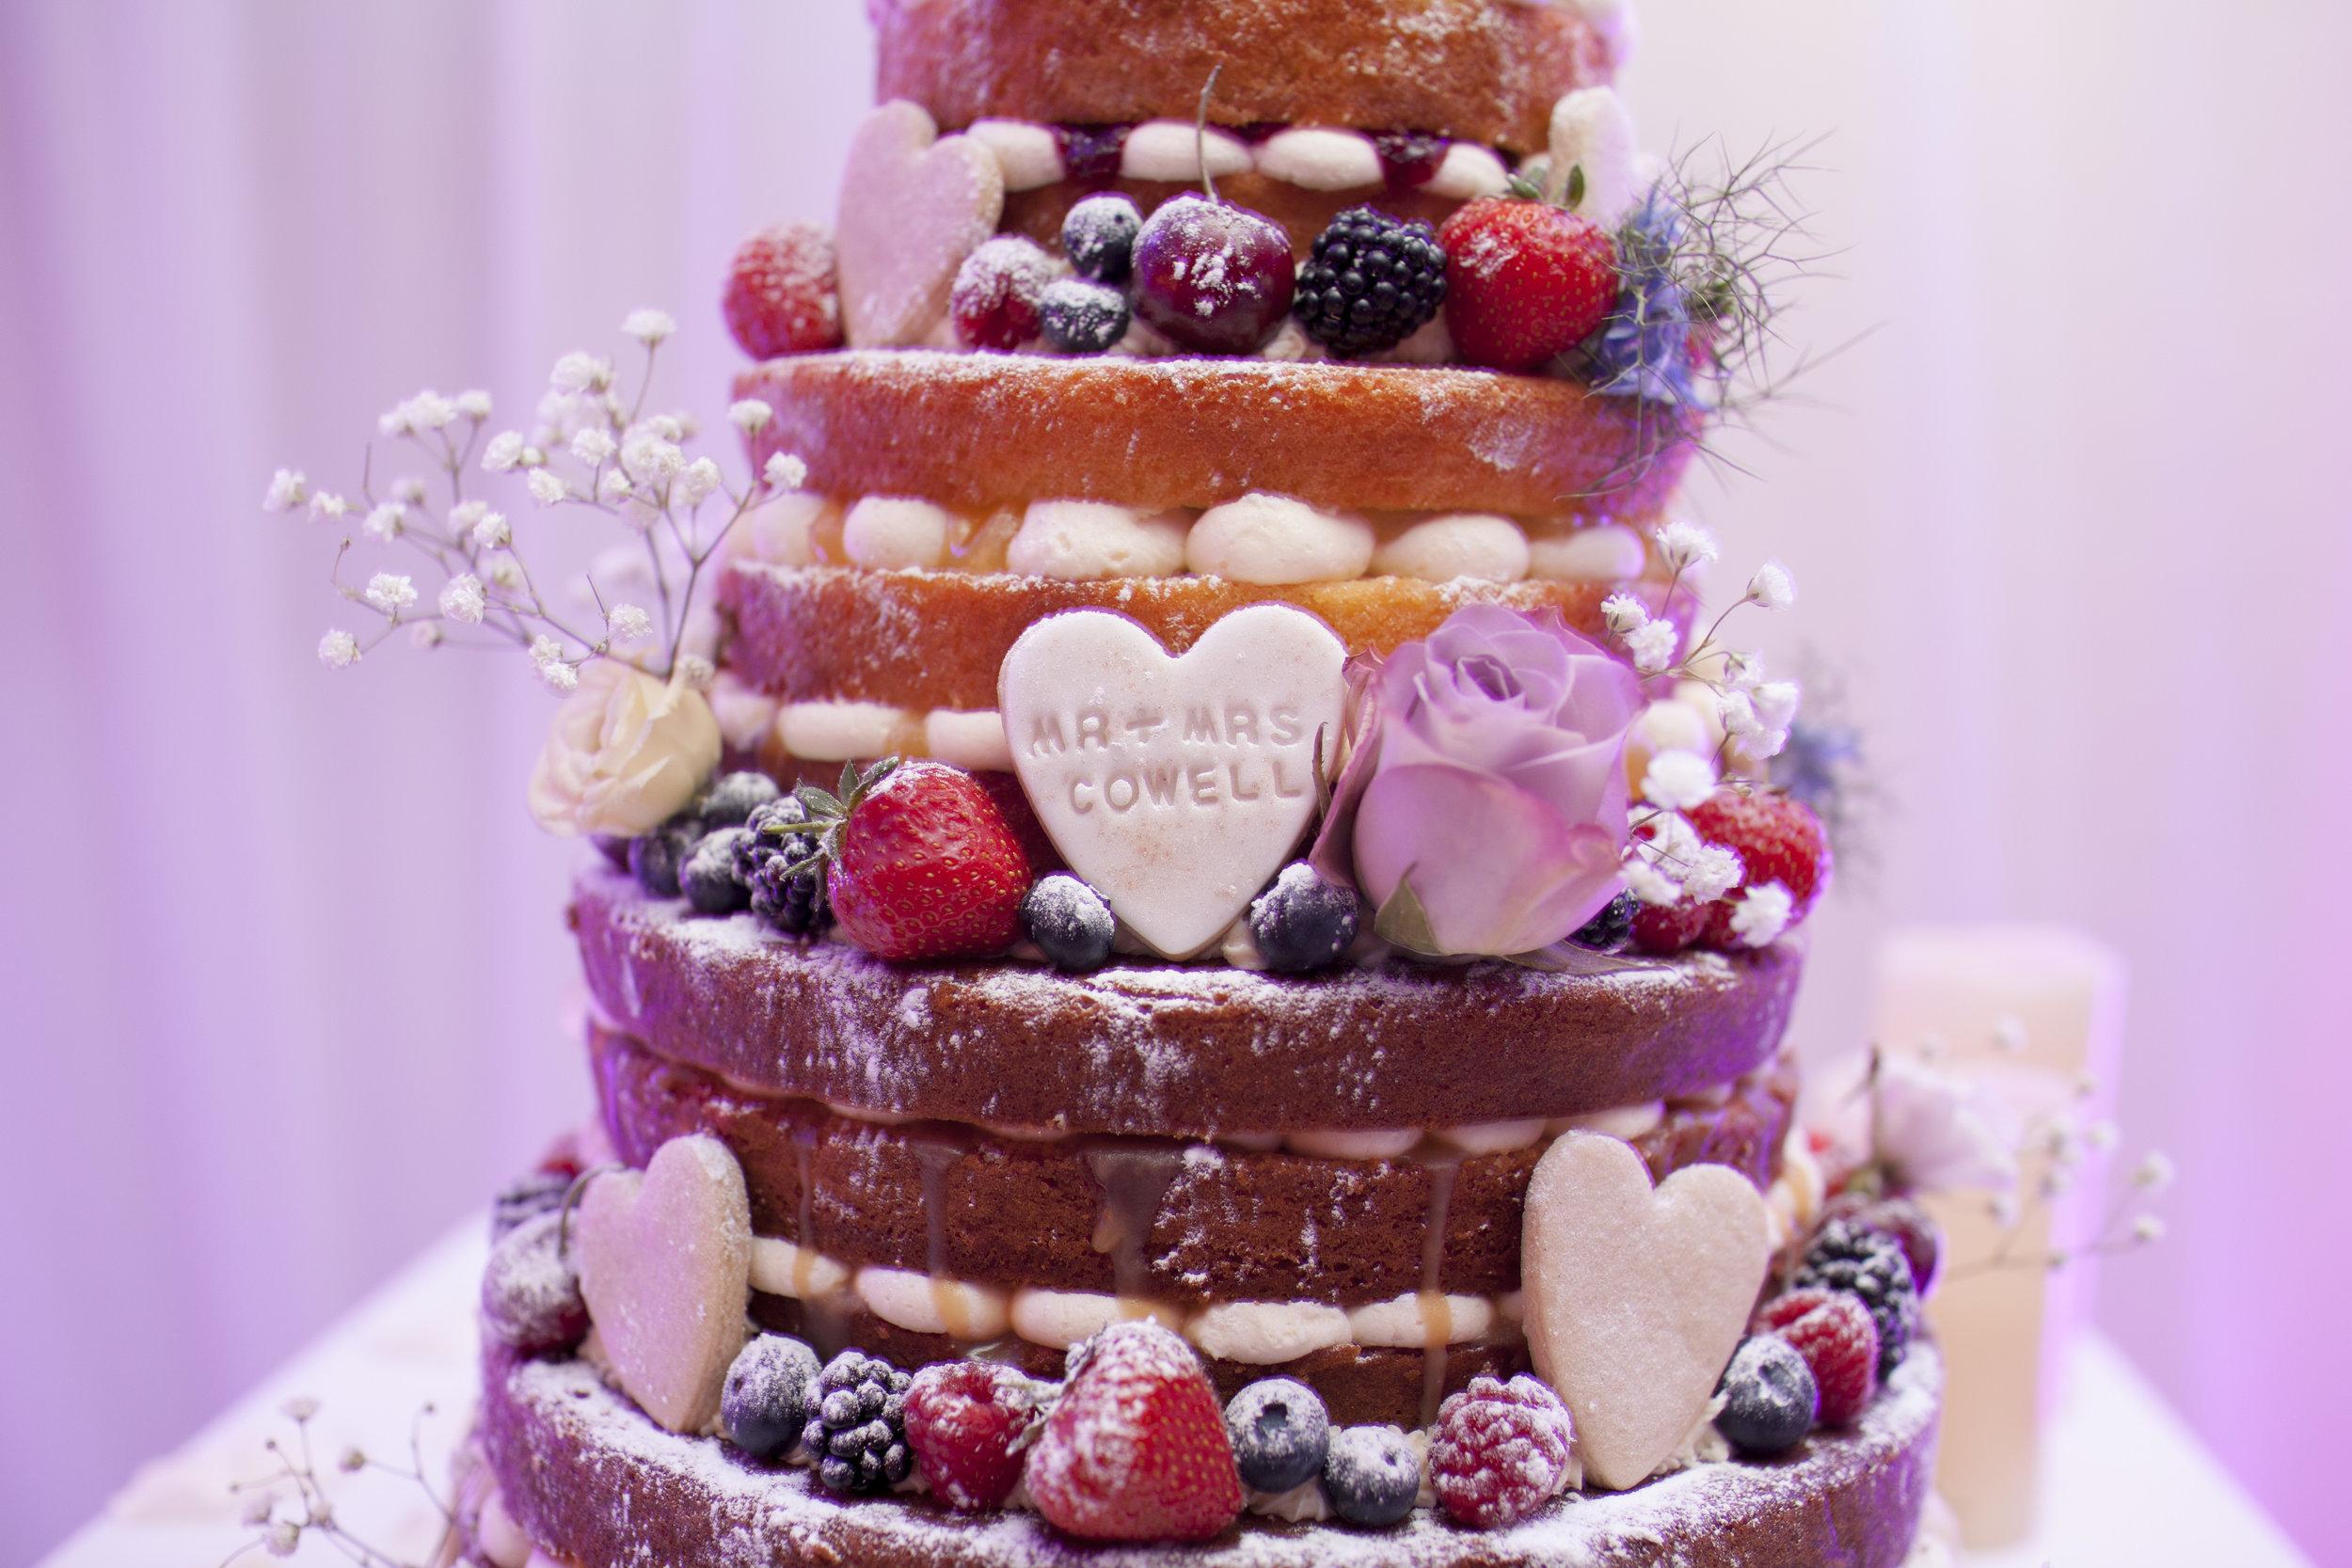 Baked by Rach wedding cake Leeds Preston Bakery DIY Wedding photography